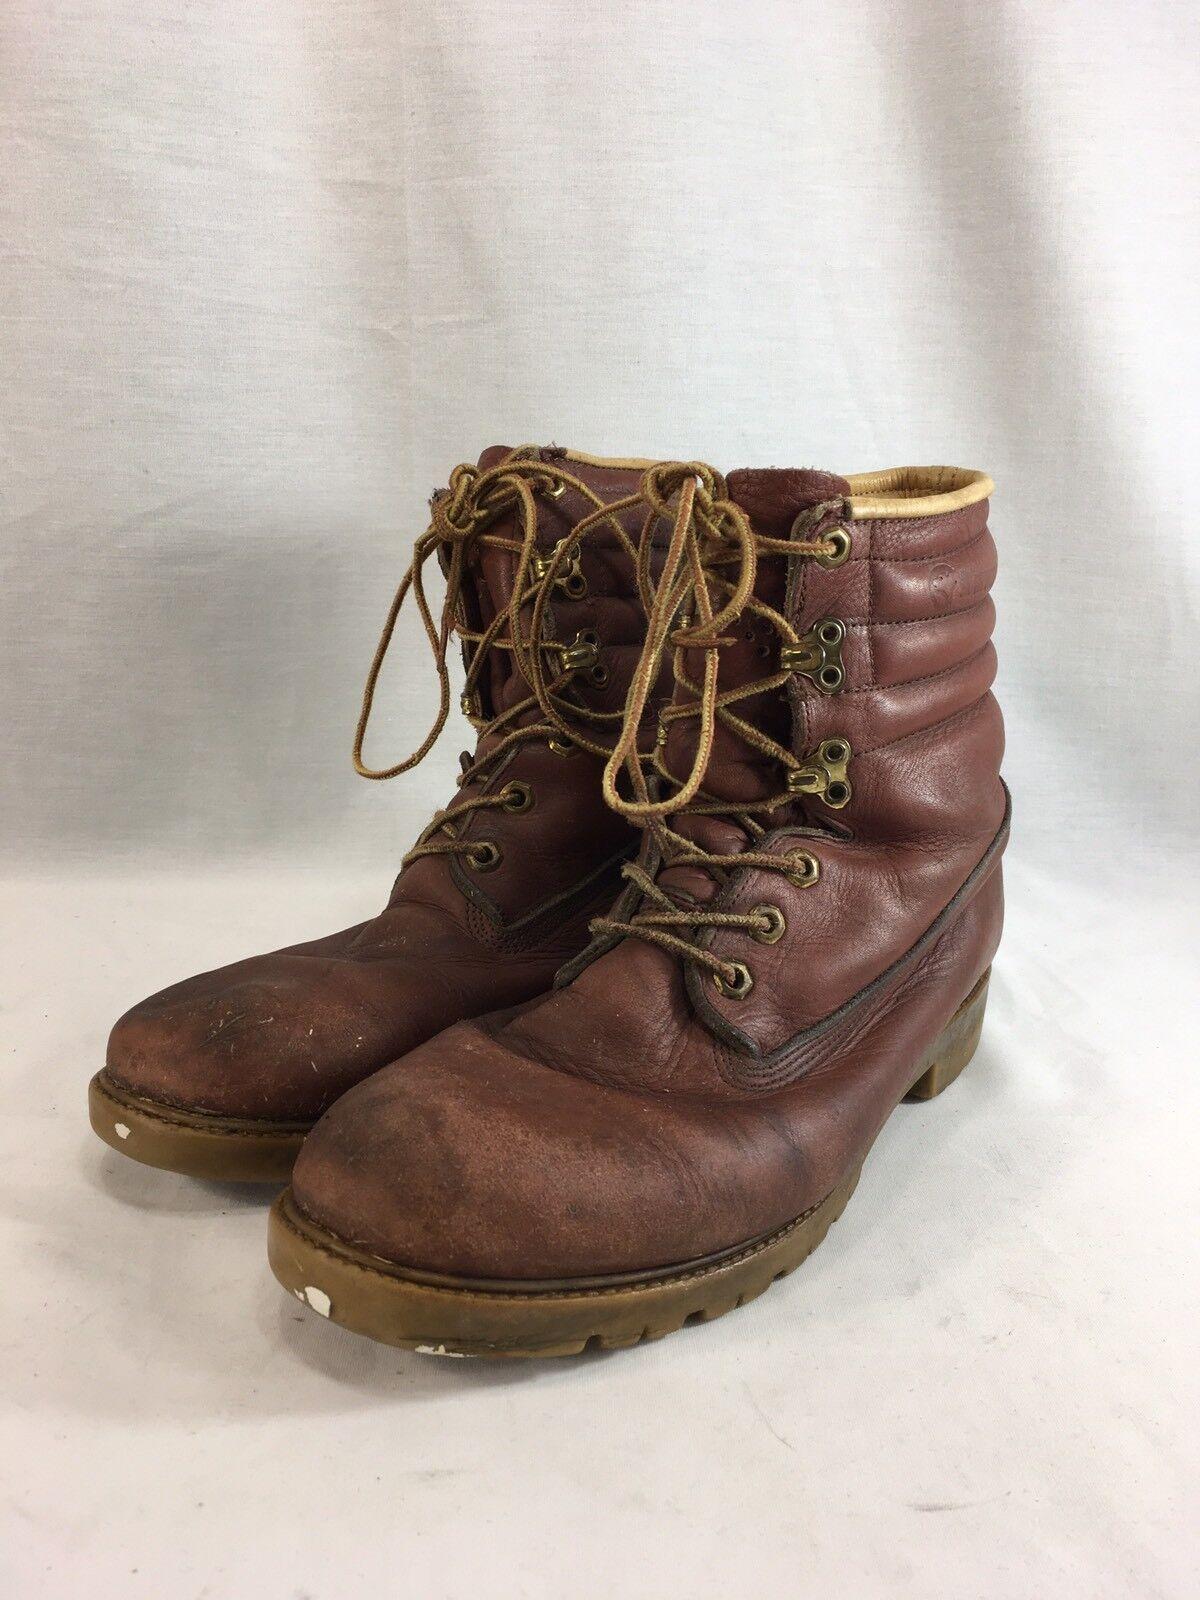 VTG Herman Survivors Work Boots shoes Mens 9 M Brown Leather